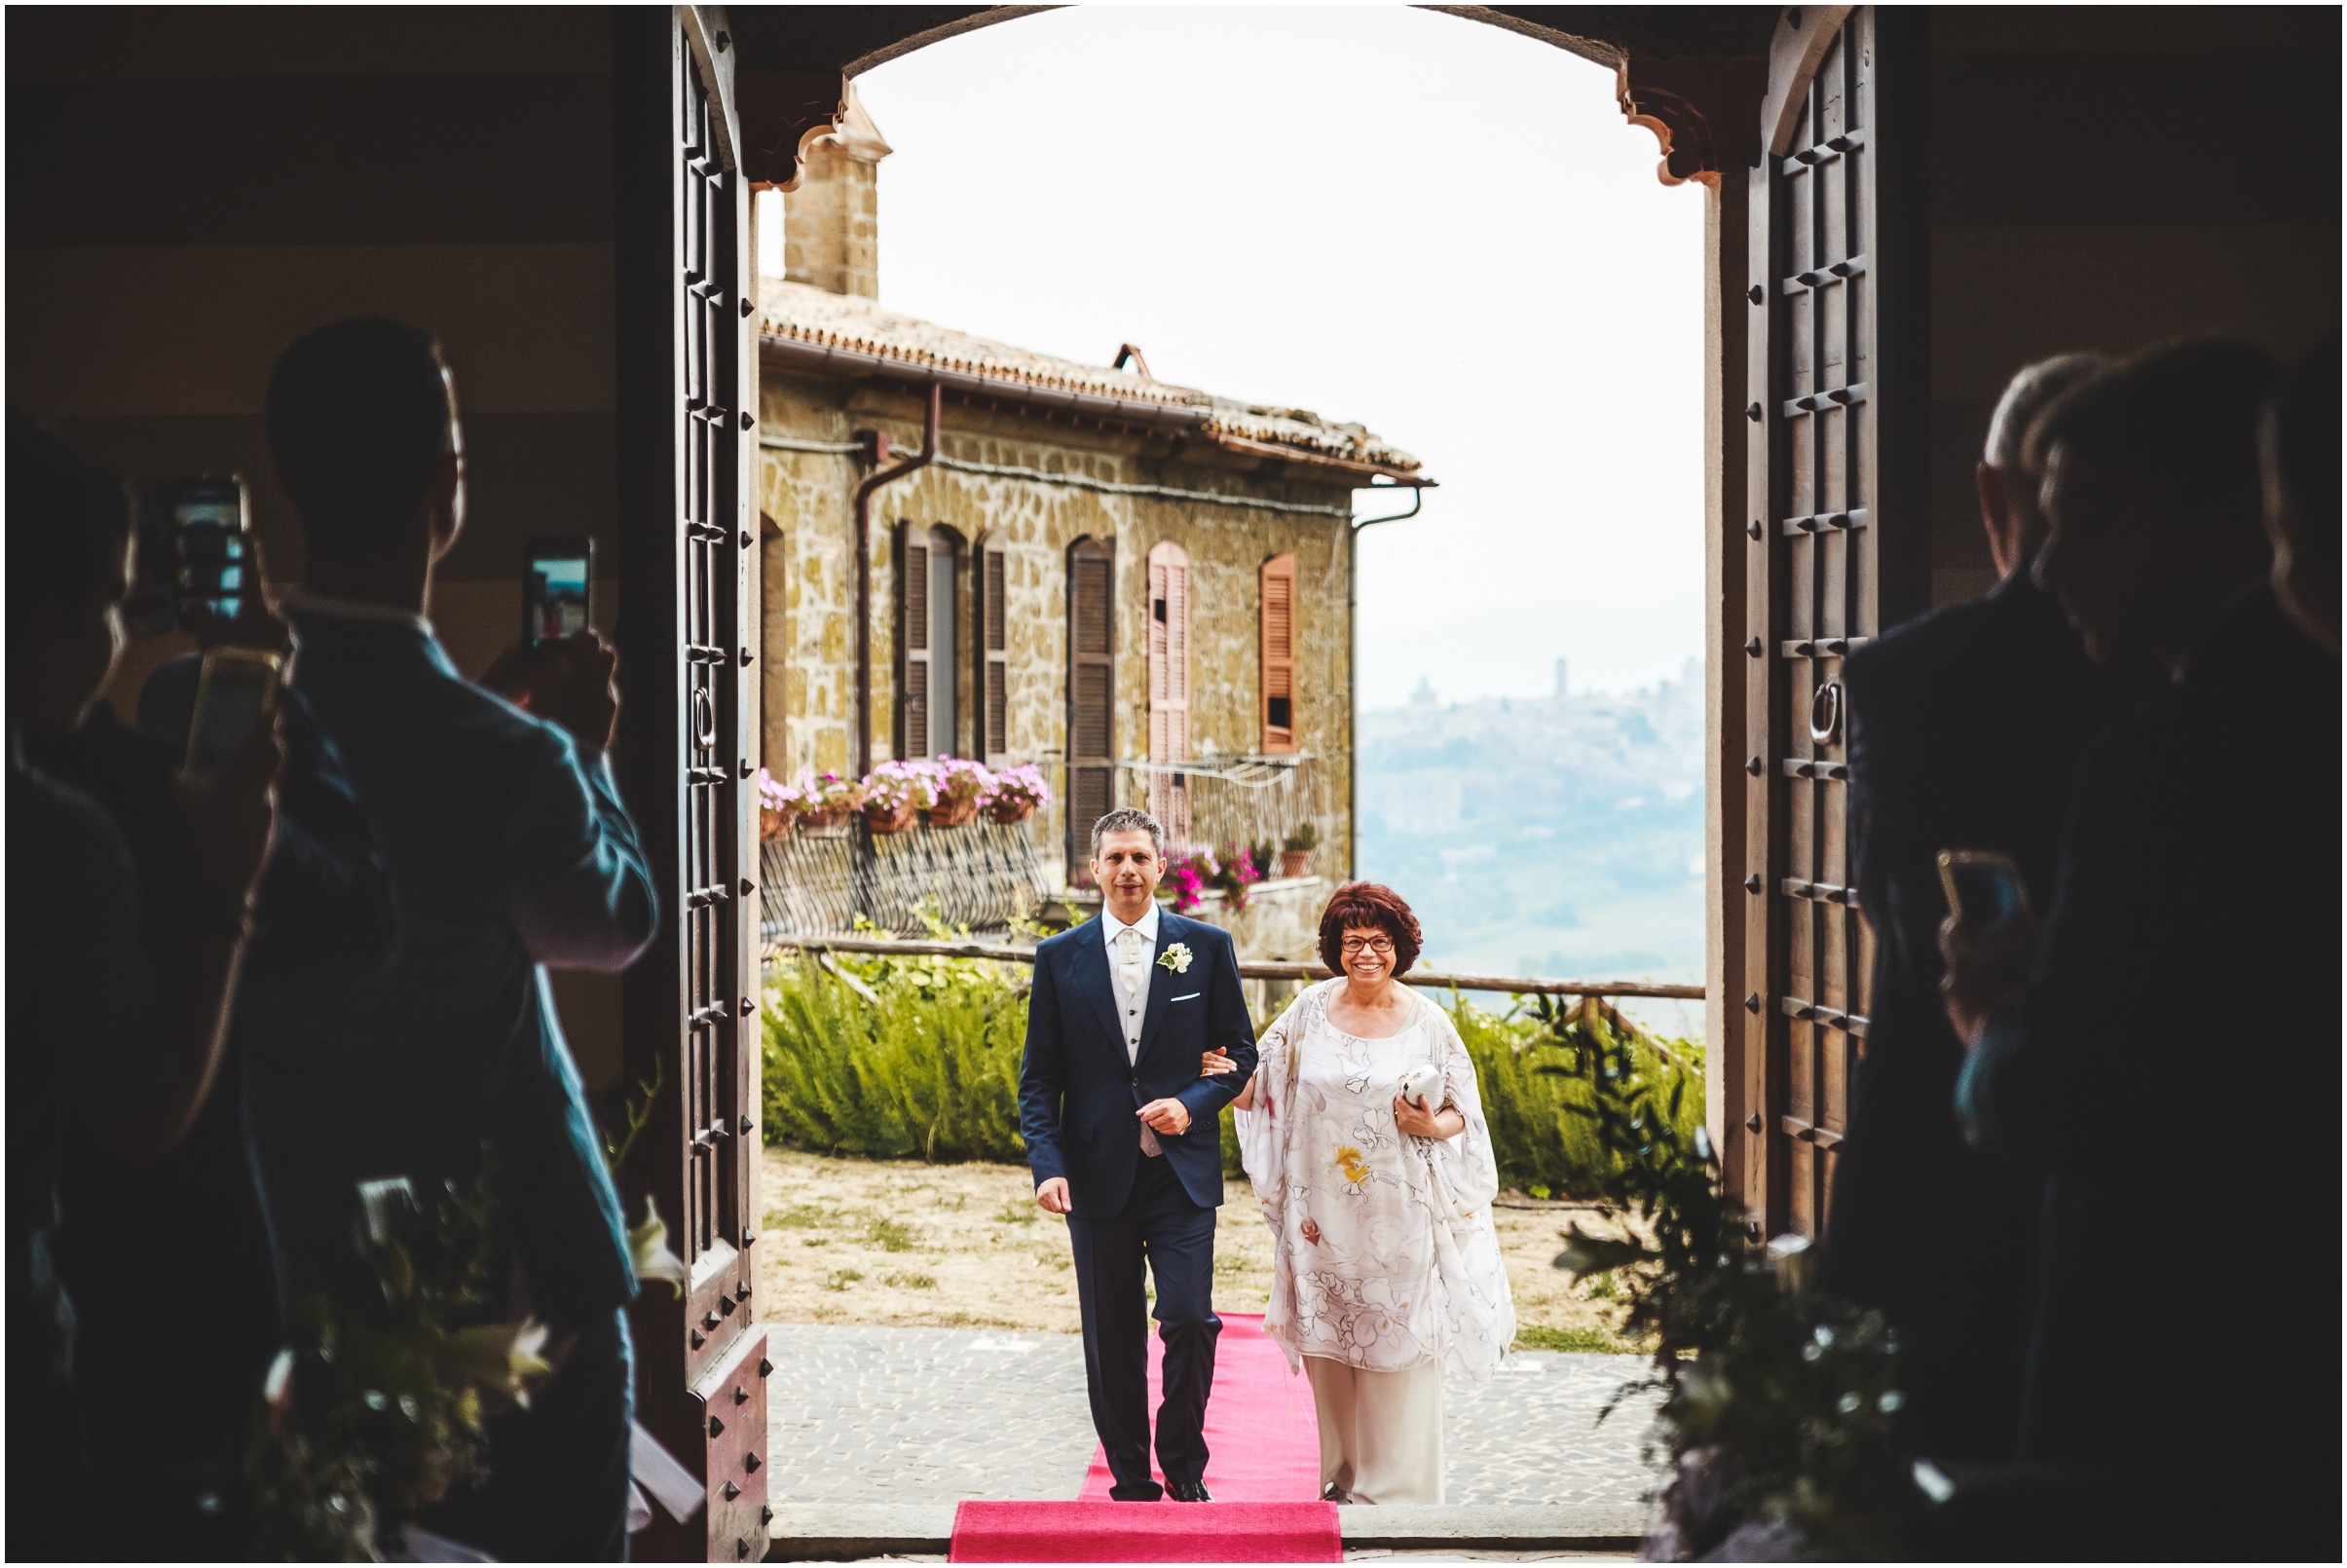 WEDDING-PHOTOGRAPHY-SARA-LORENZONI-FOTOGRAFIA-MATRIMONIO-ORVIETO-JUKA-ANTONELLO07